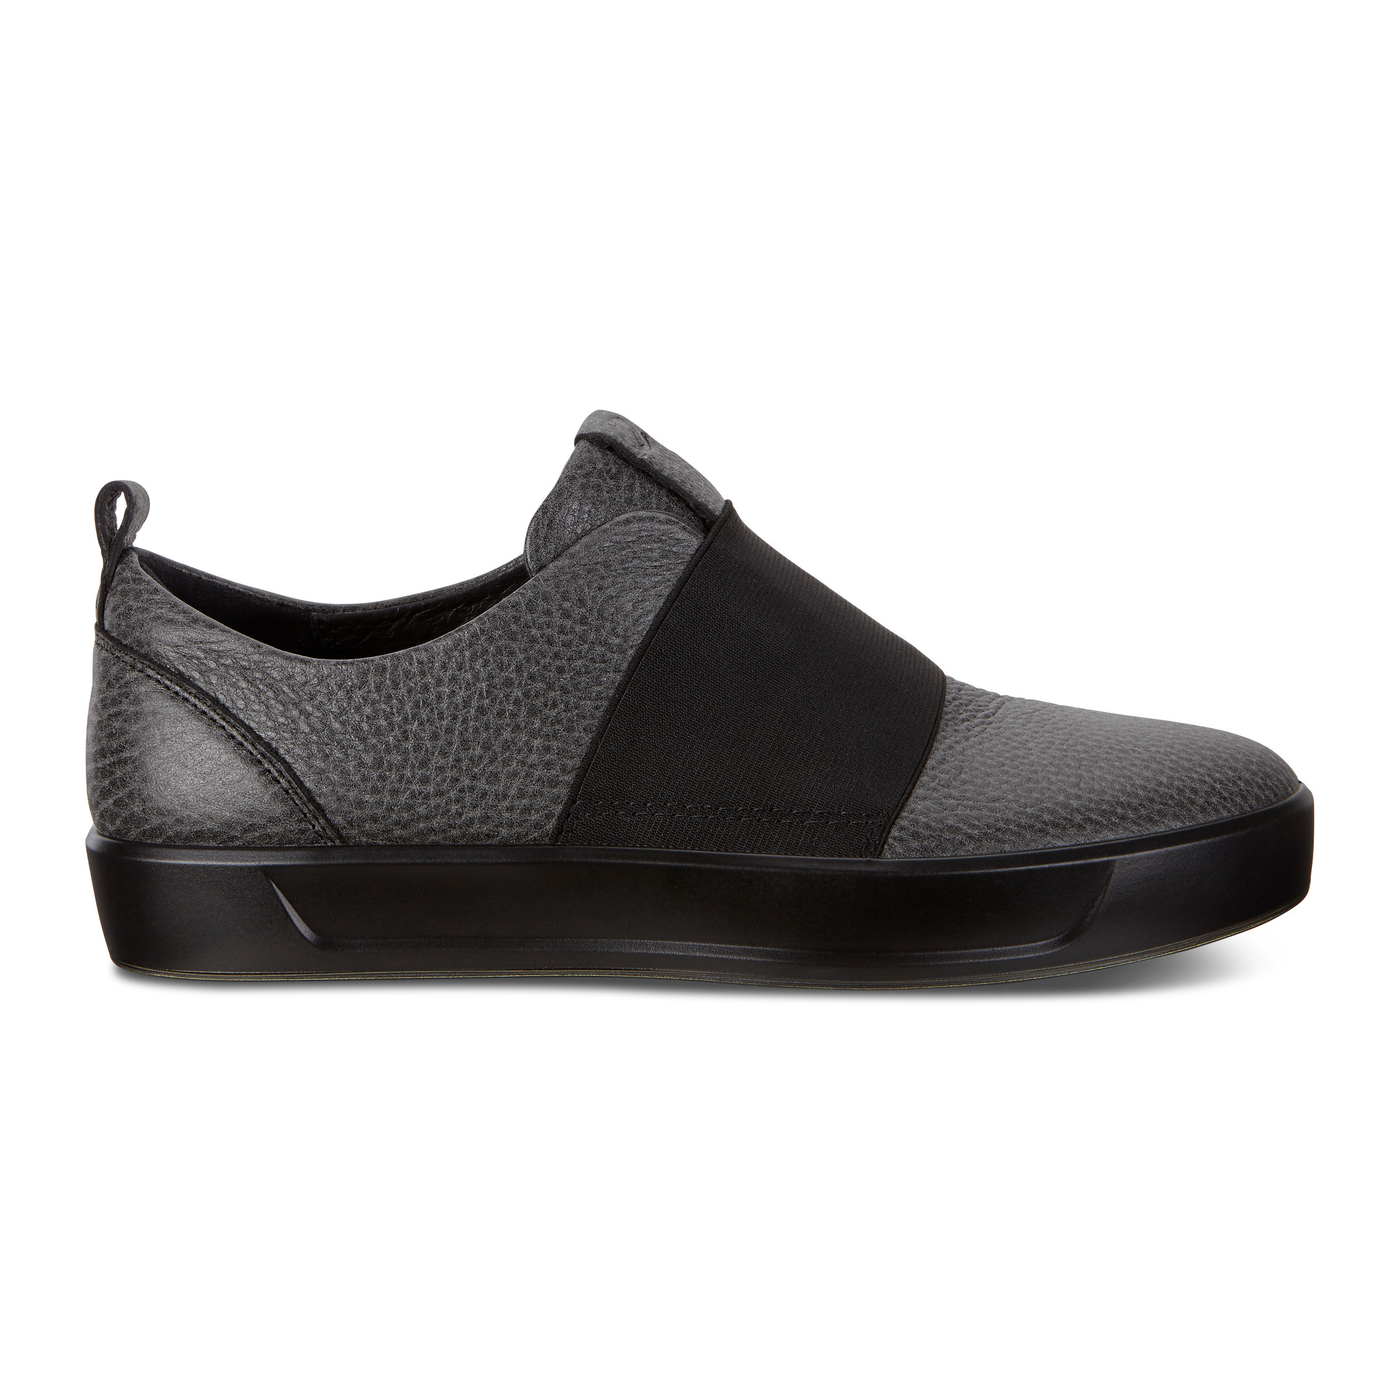 ECCO SOFT 8 W Shoe